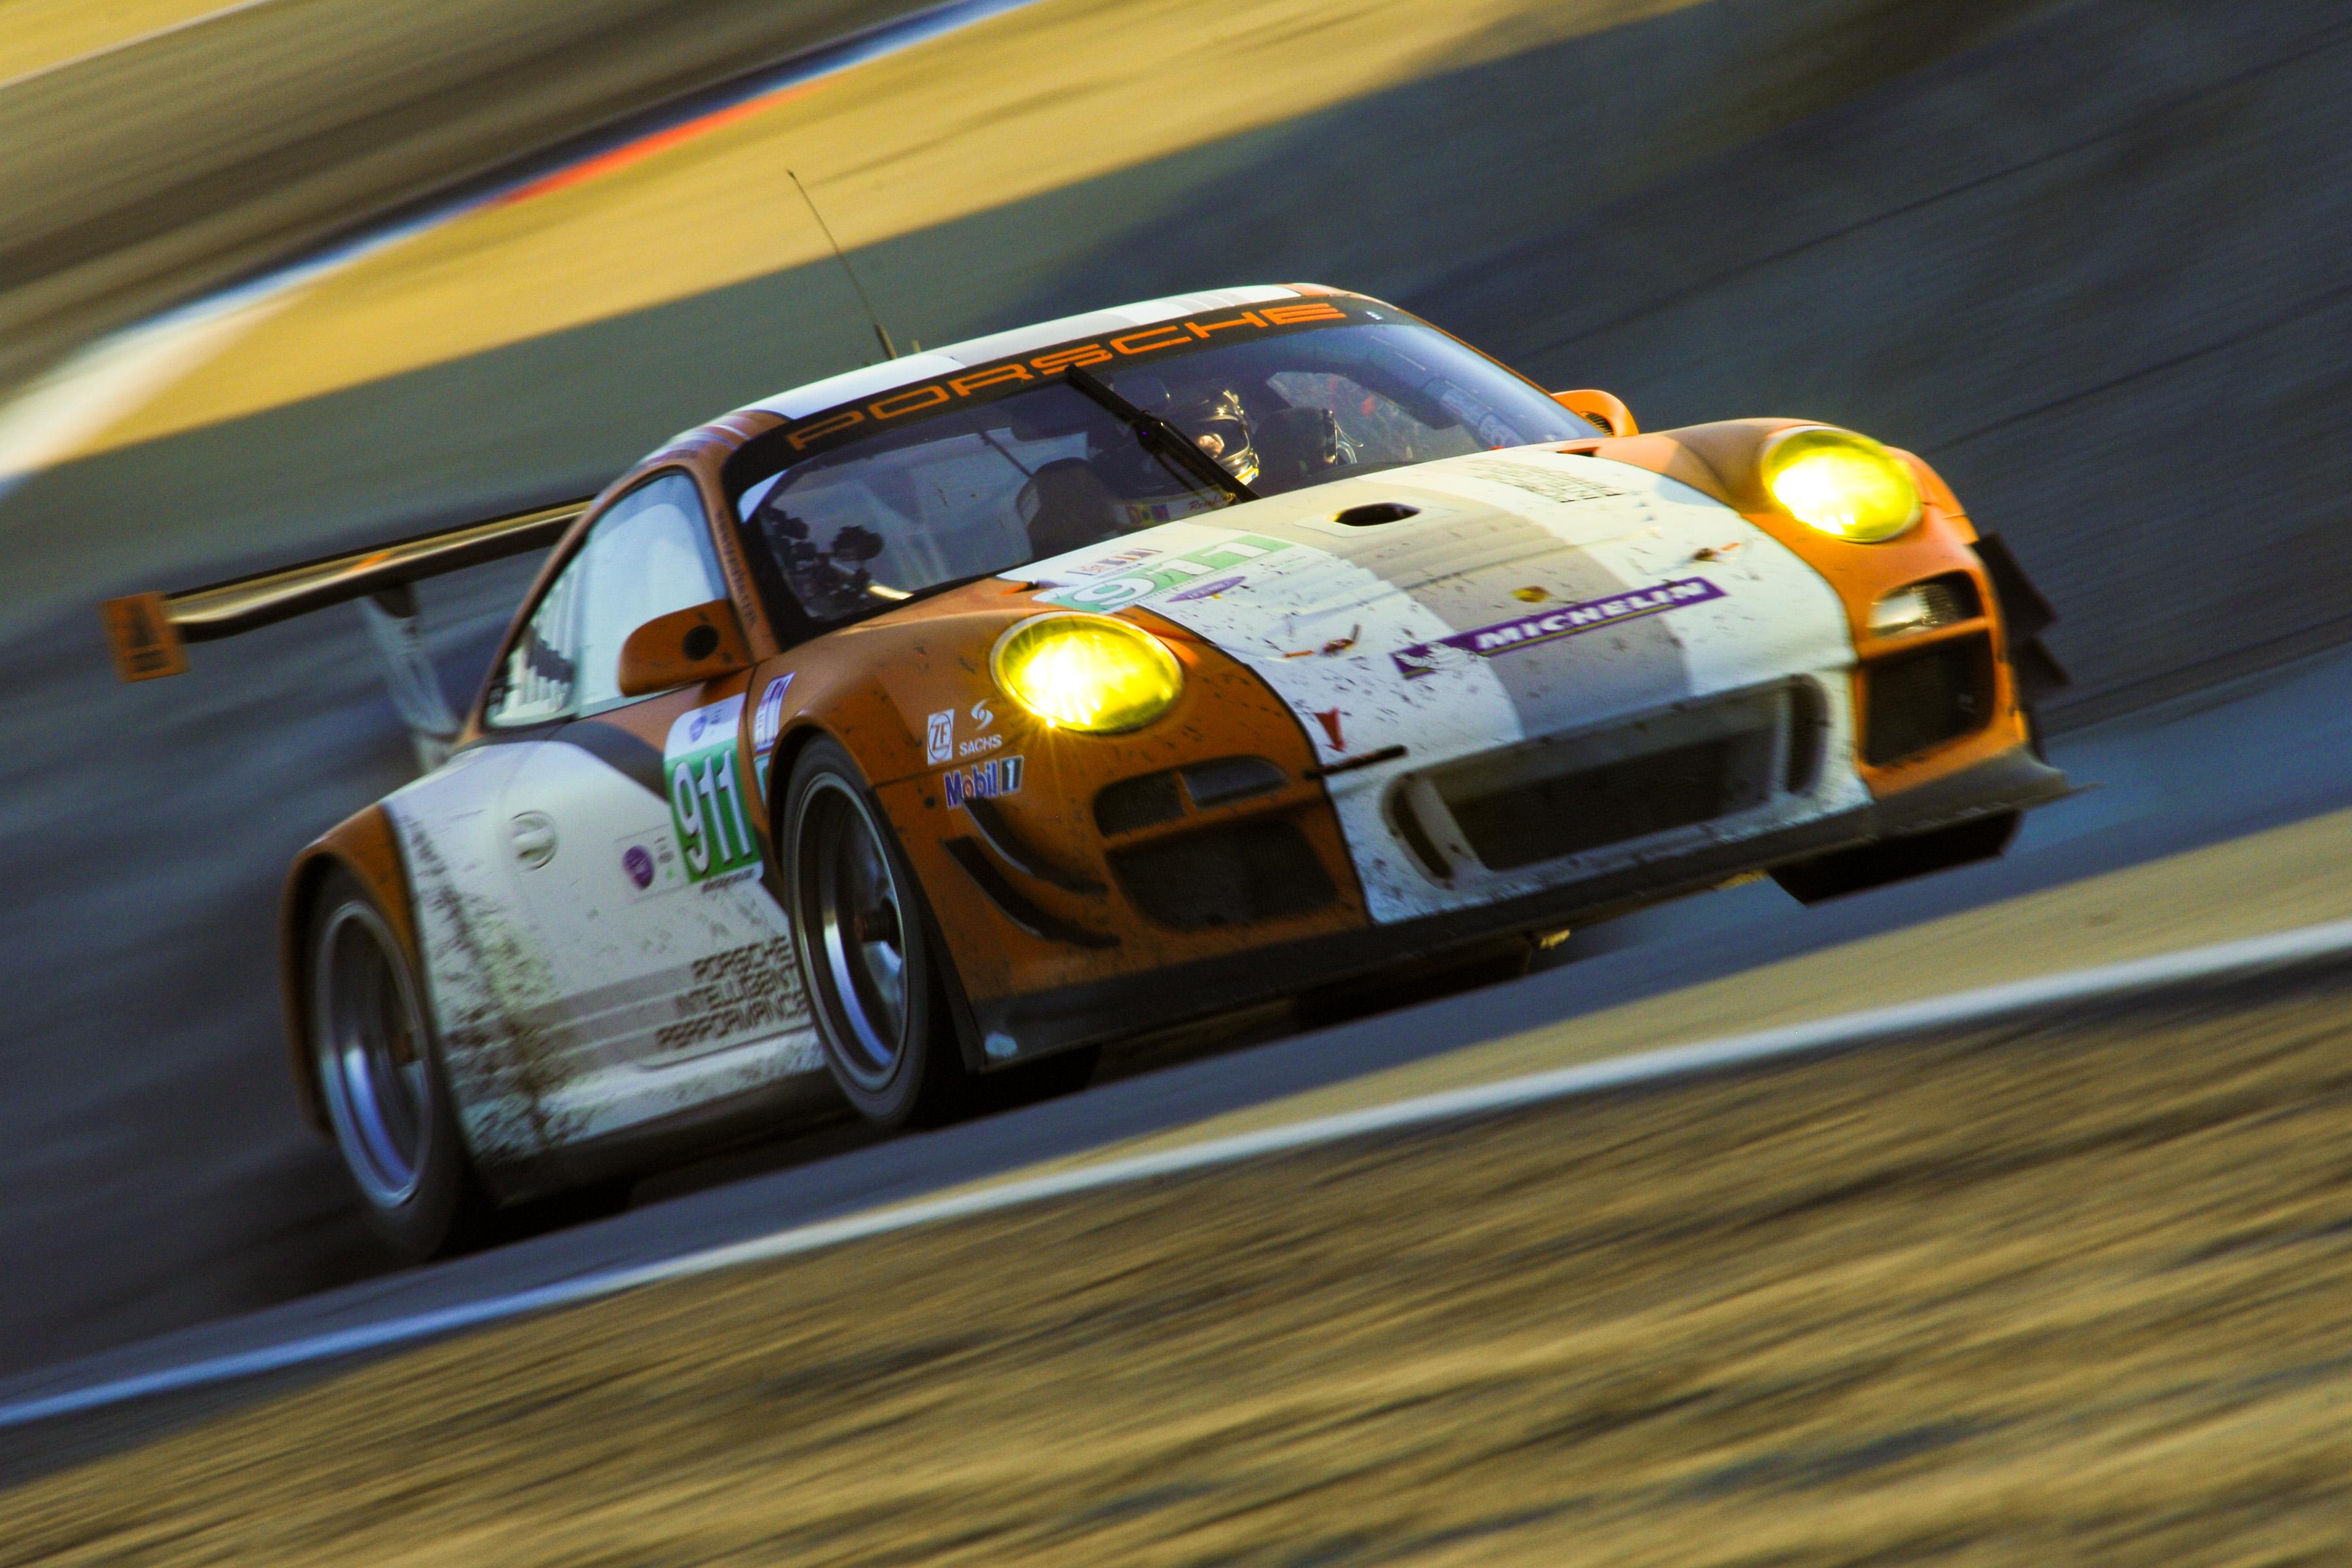 m11_3934_fine Inspiring Porsche 911 Gt1 Road atlanta Cars Trend